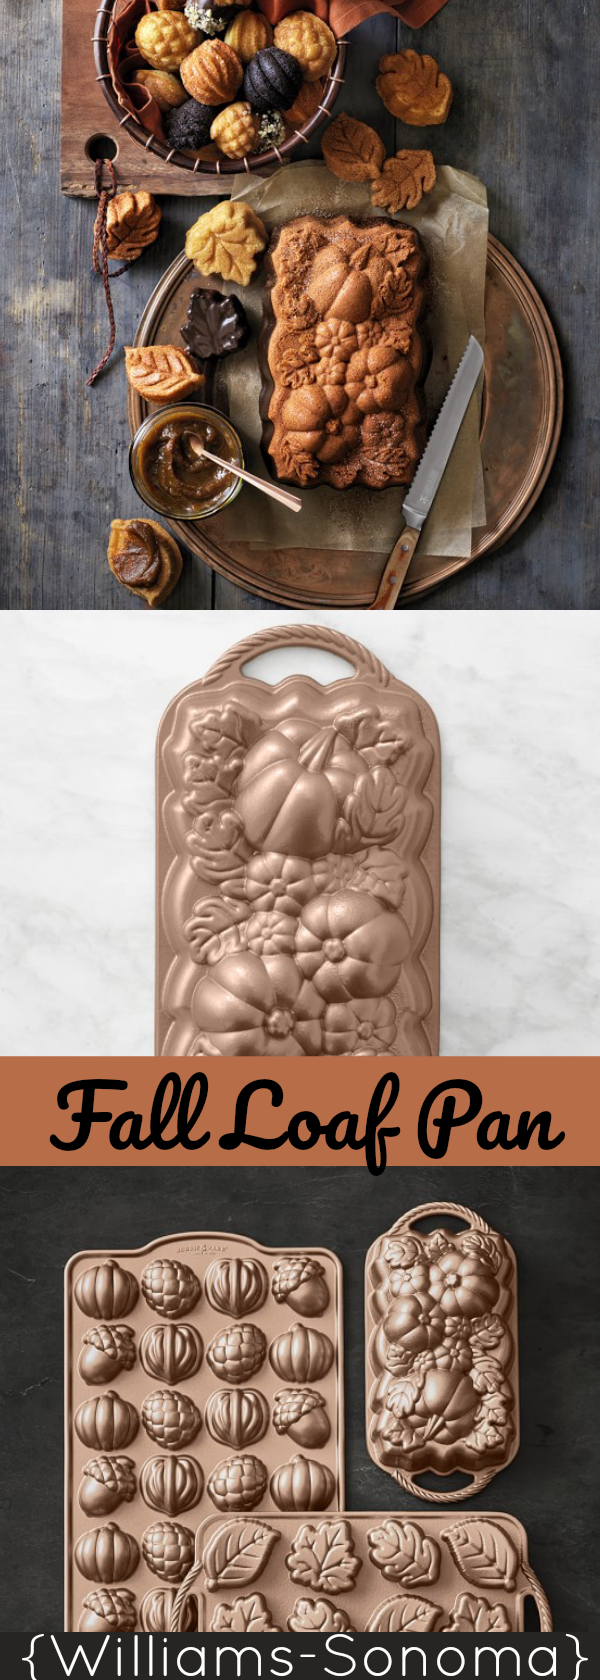 Nordic Ware Fall Loaf Pan And Muffin Tins Fall Baking